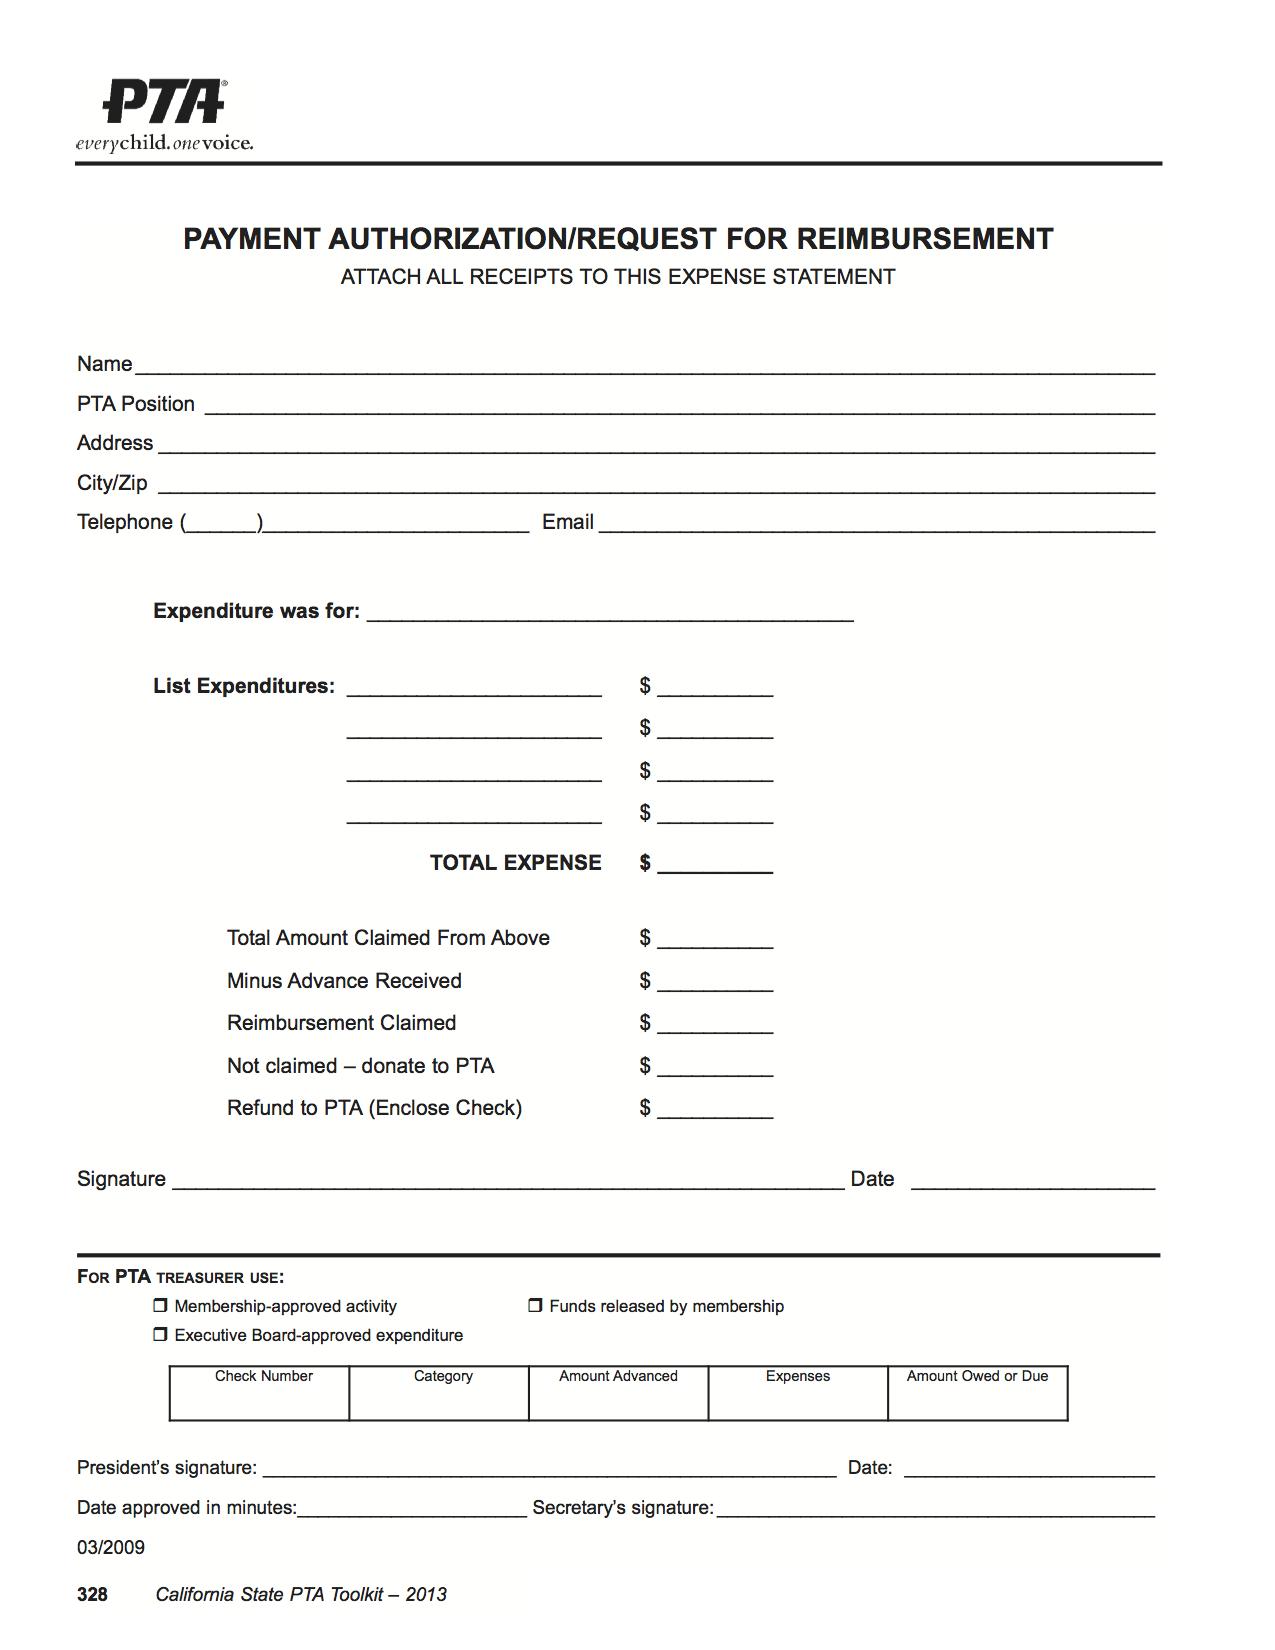 PTA Reimbursement Form Point Vicente PTA Point Vicente Elementary – Reimbursement Form